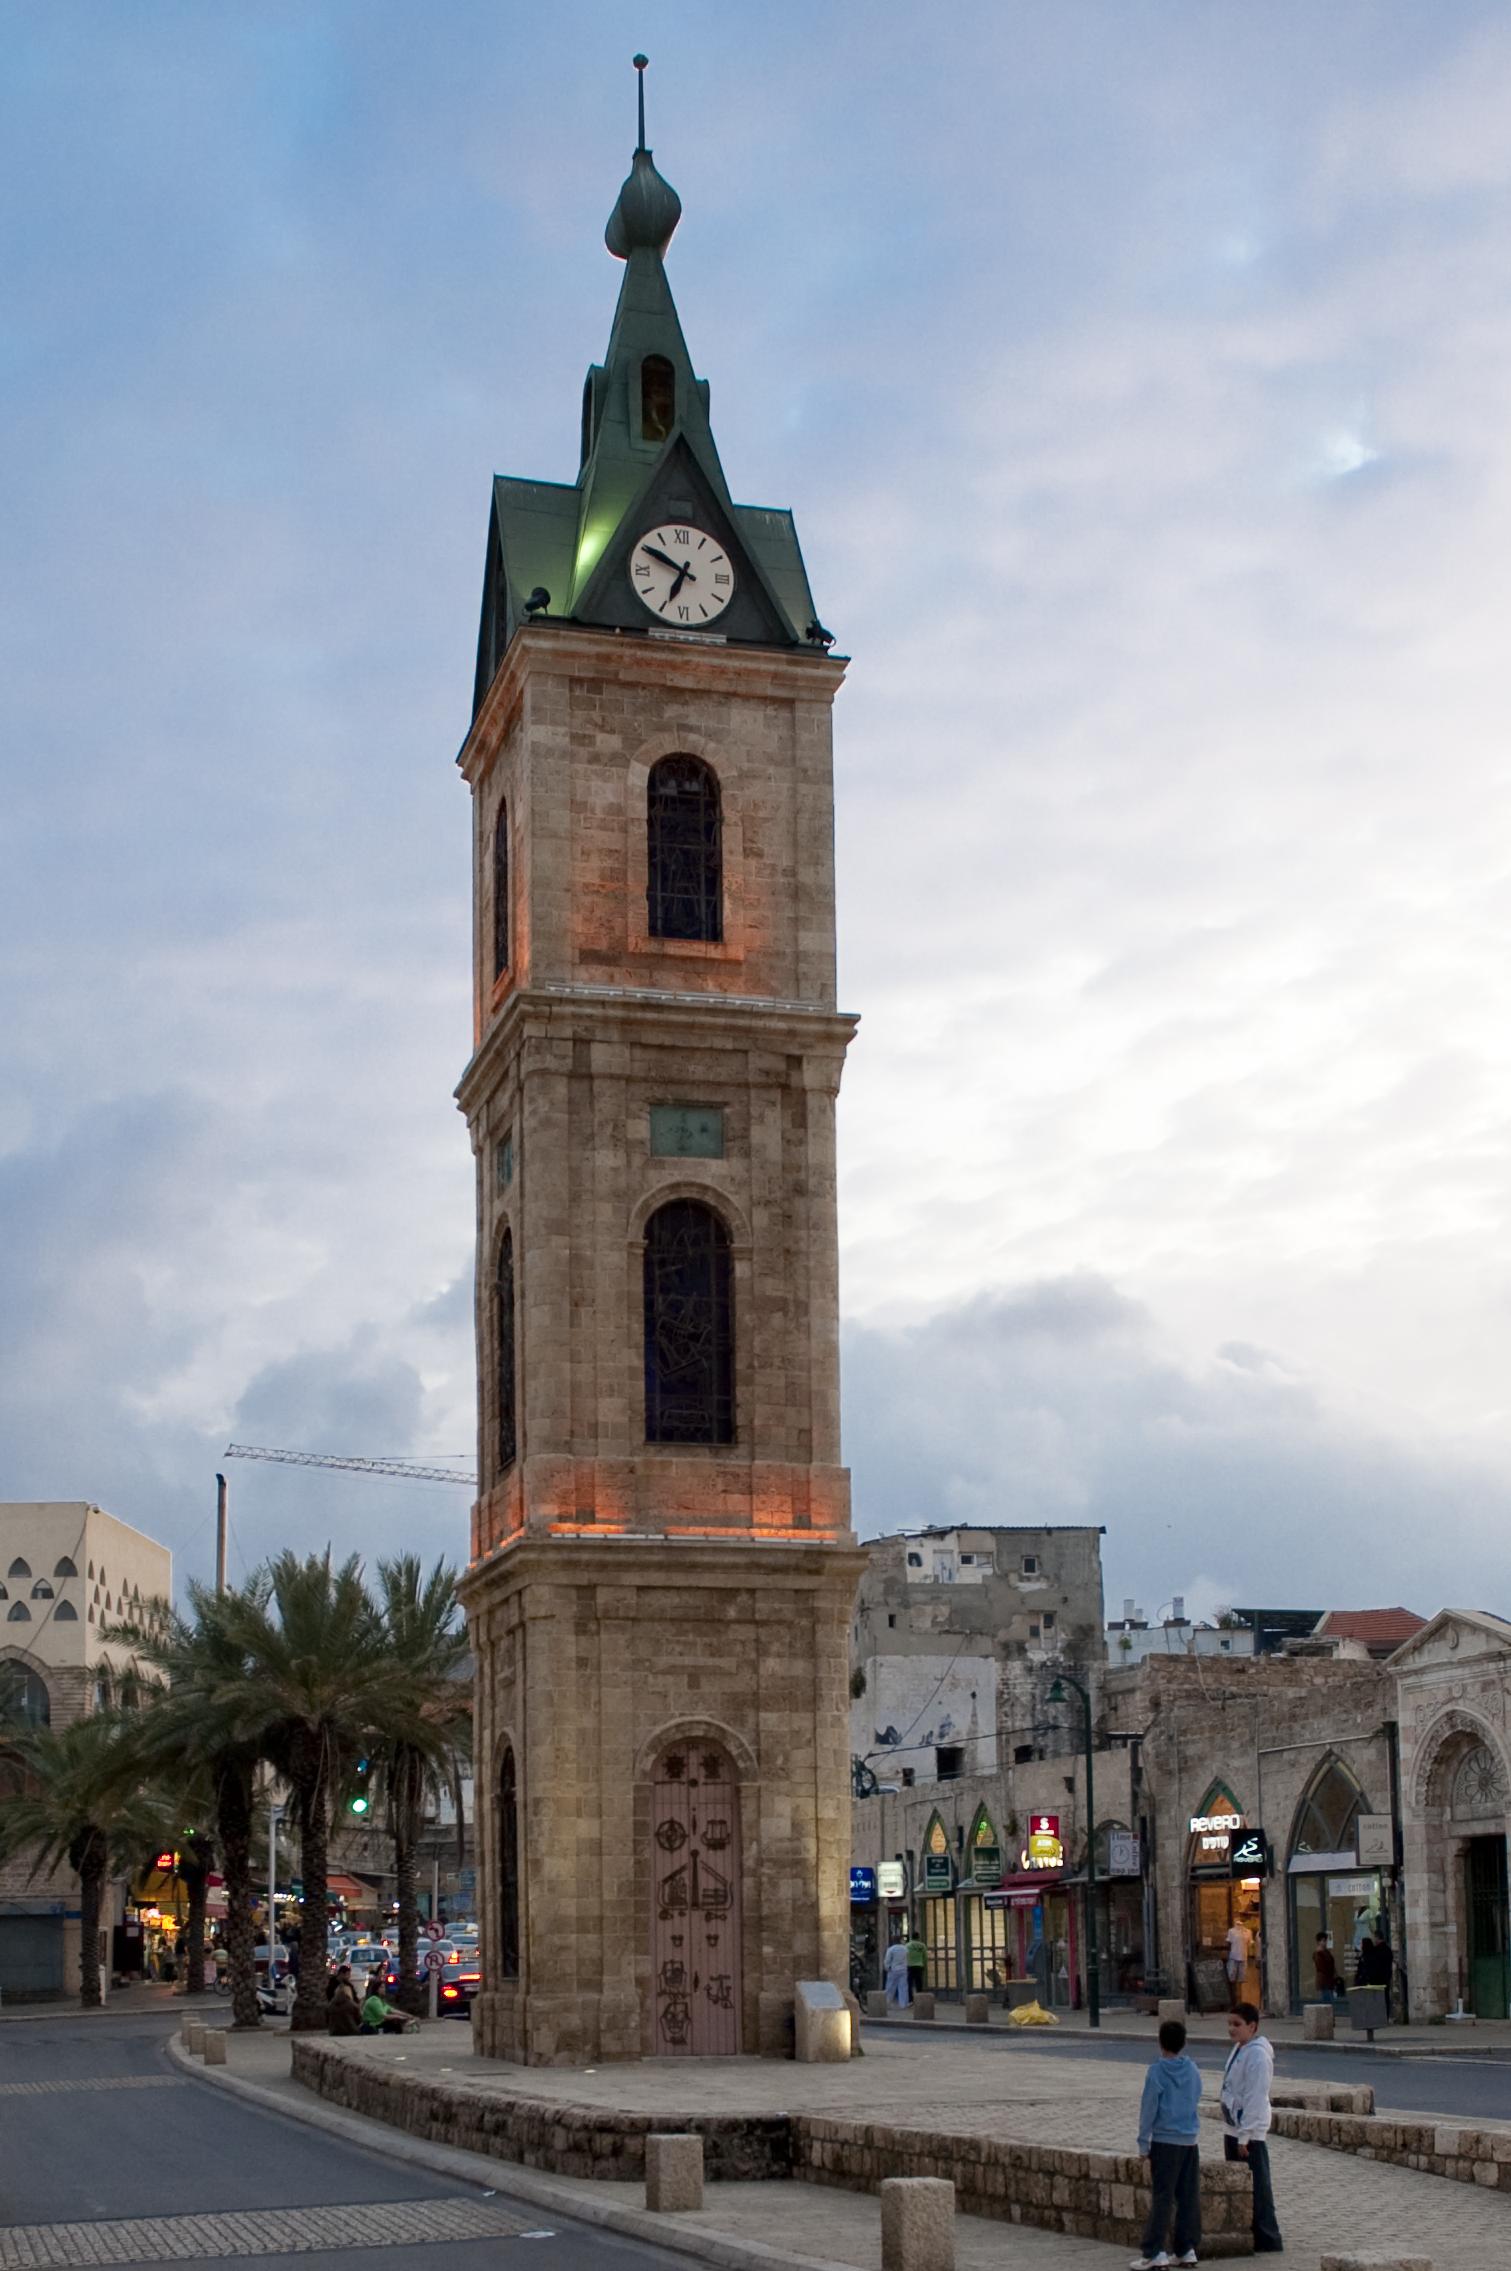 File:Jaffa clock tower 1.jpg